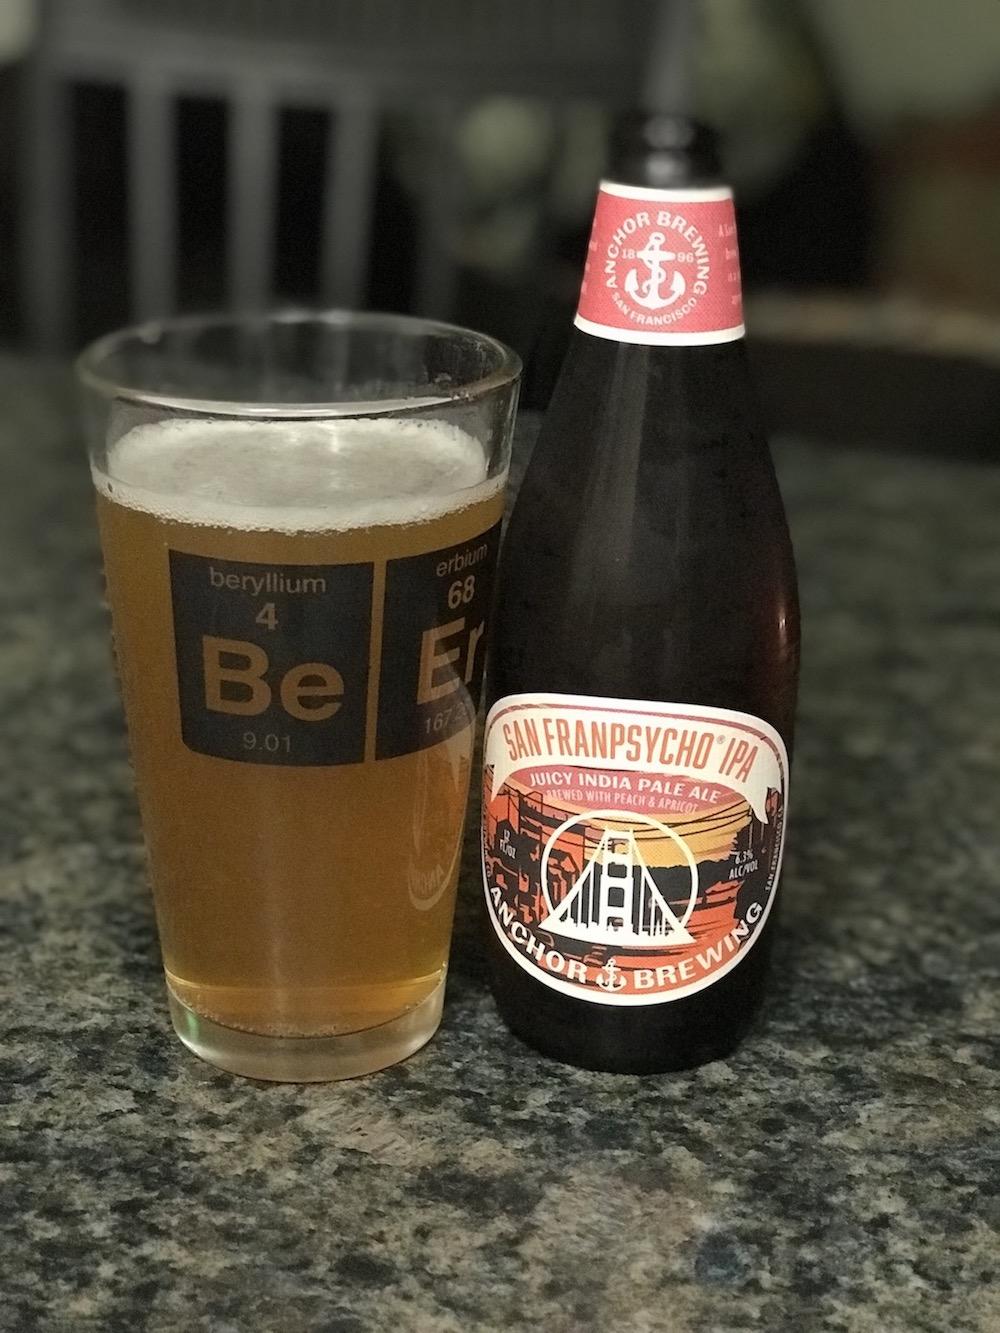 San Franpsycho IPA by Anchor Brewing Company